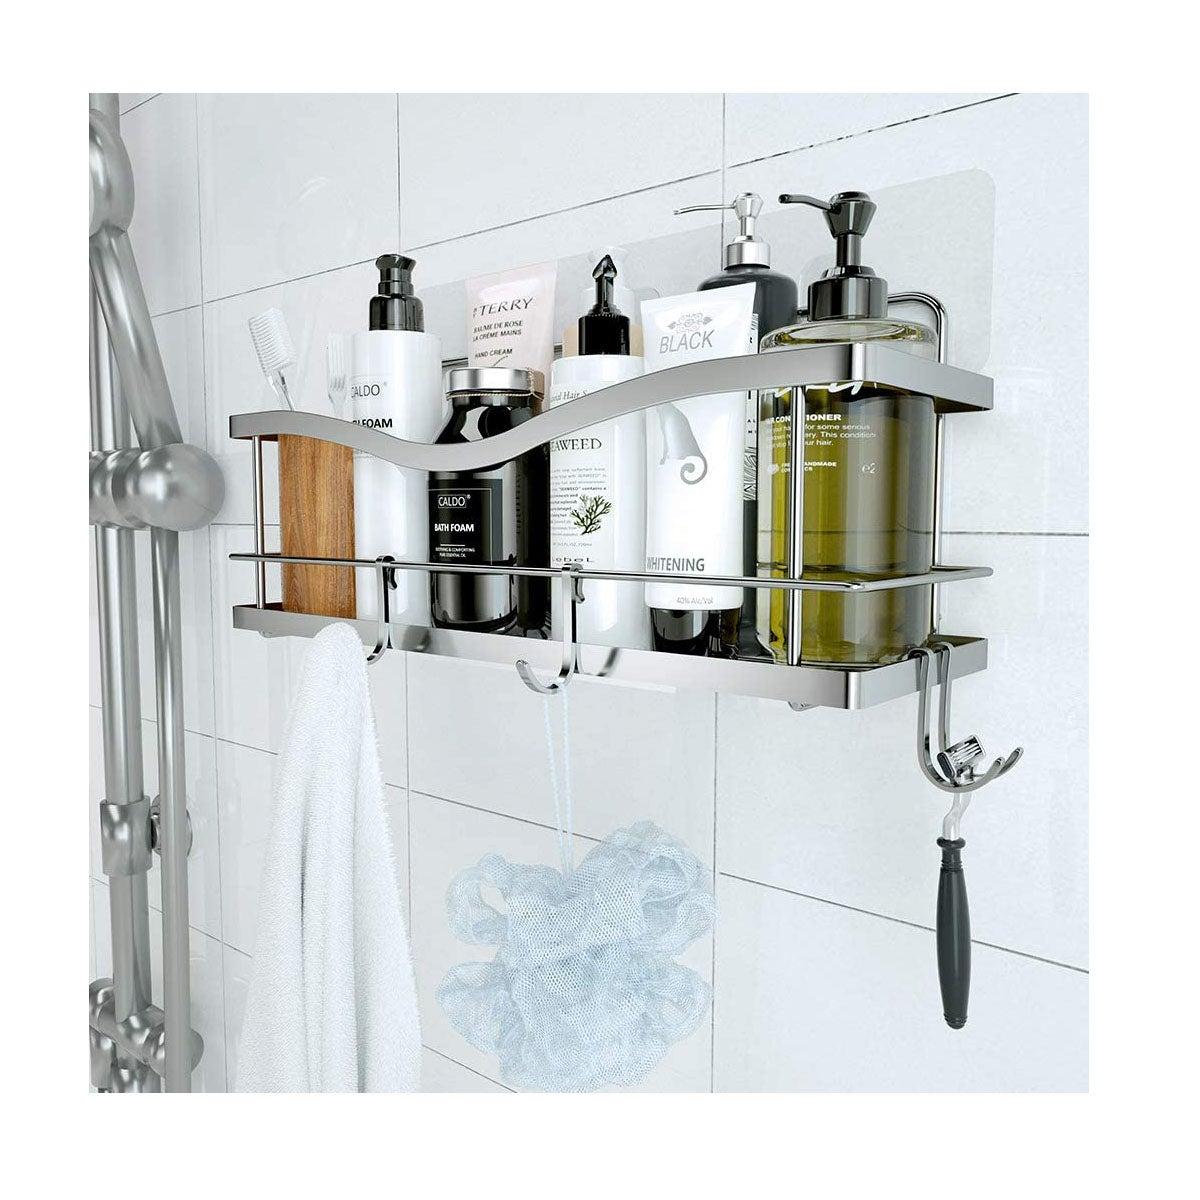 The Best Shower Caddies For Bathroom Clutter Bob Vila